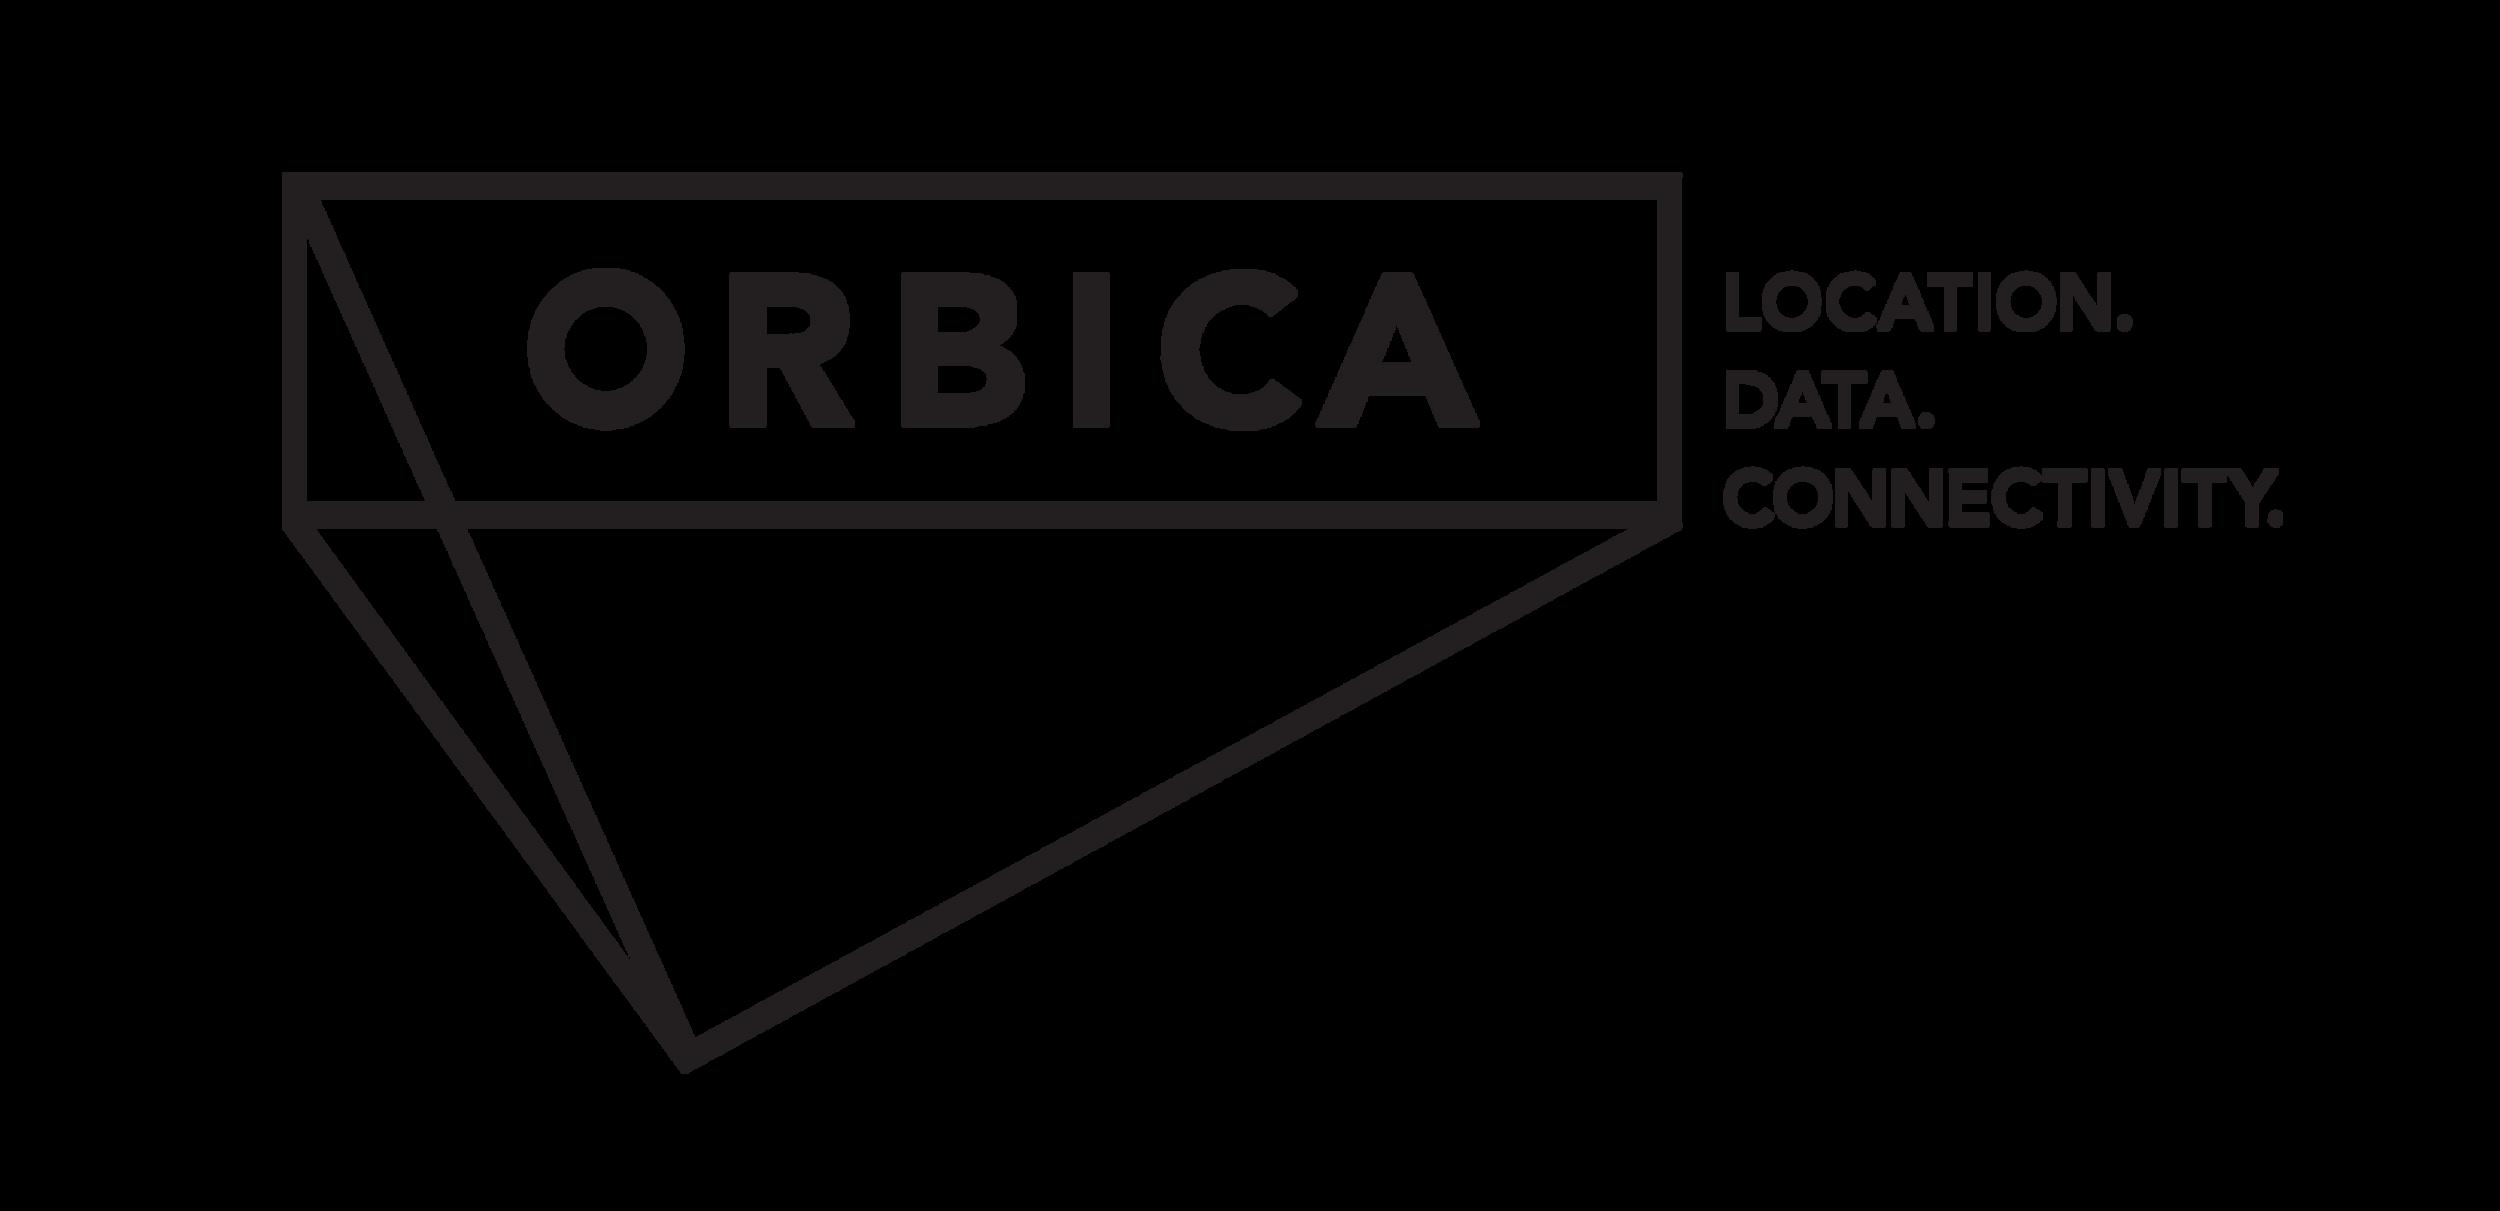 orbica-logo.png